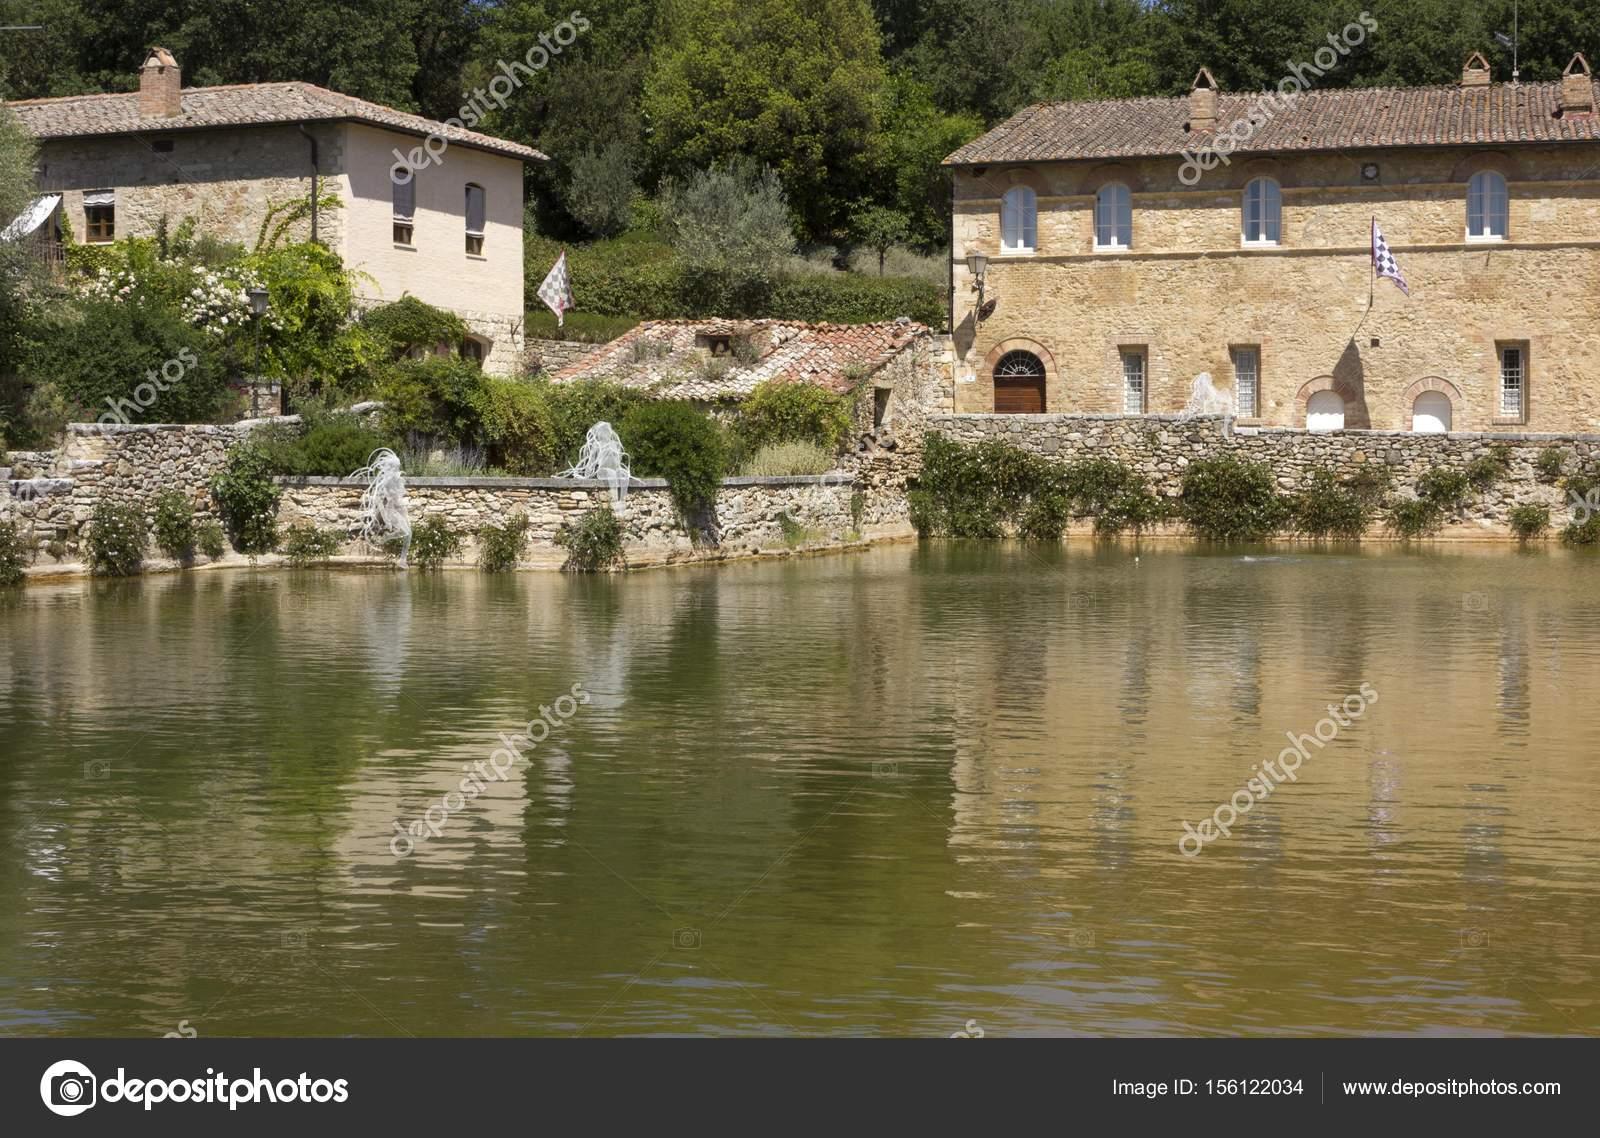 https://st3.depositphotos.com/3585787/15612/i/1600/depositphotos_156122034-stock-photo-bagno-vignoni-medieval-town-with.jpg